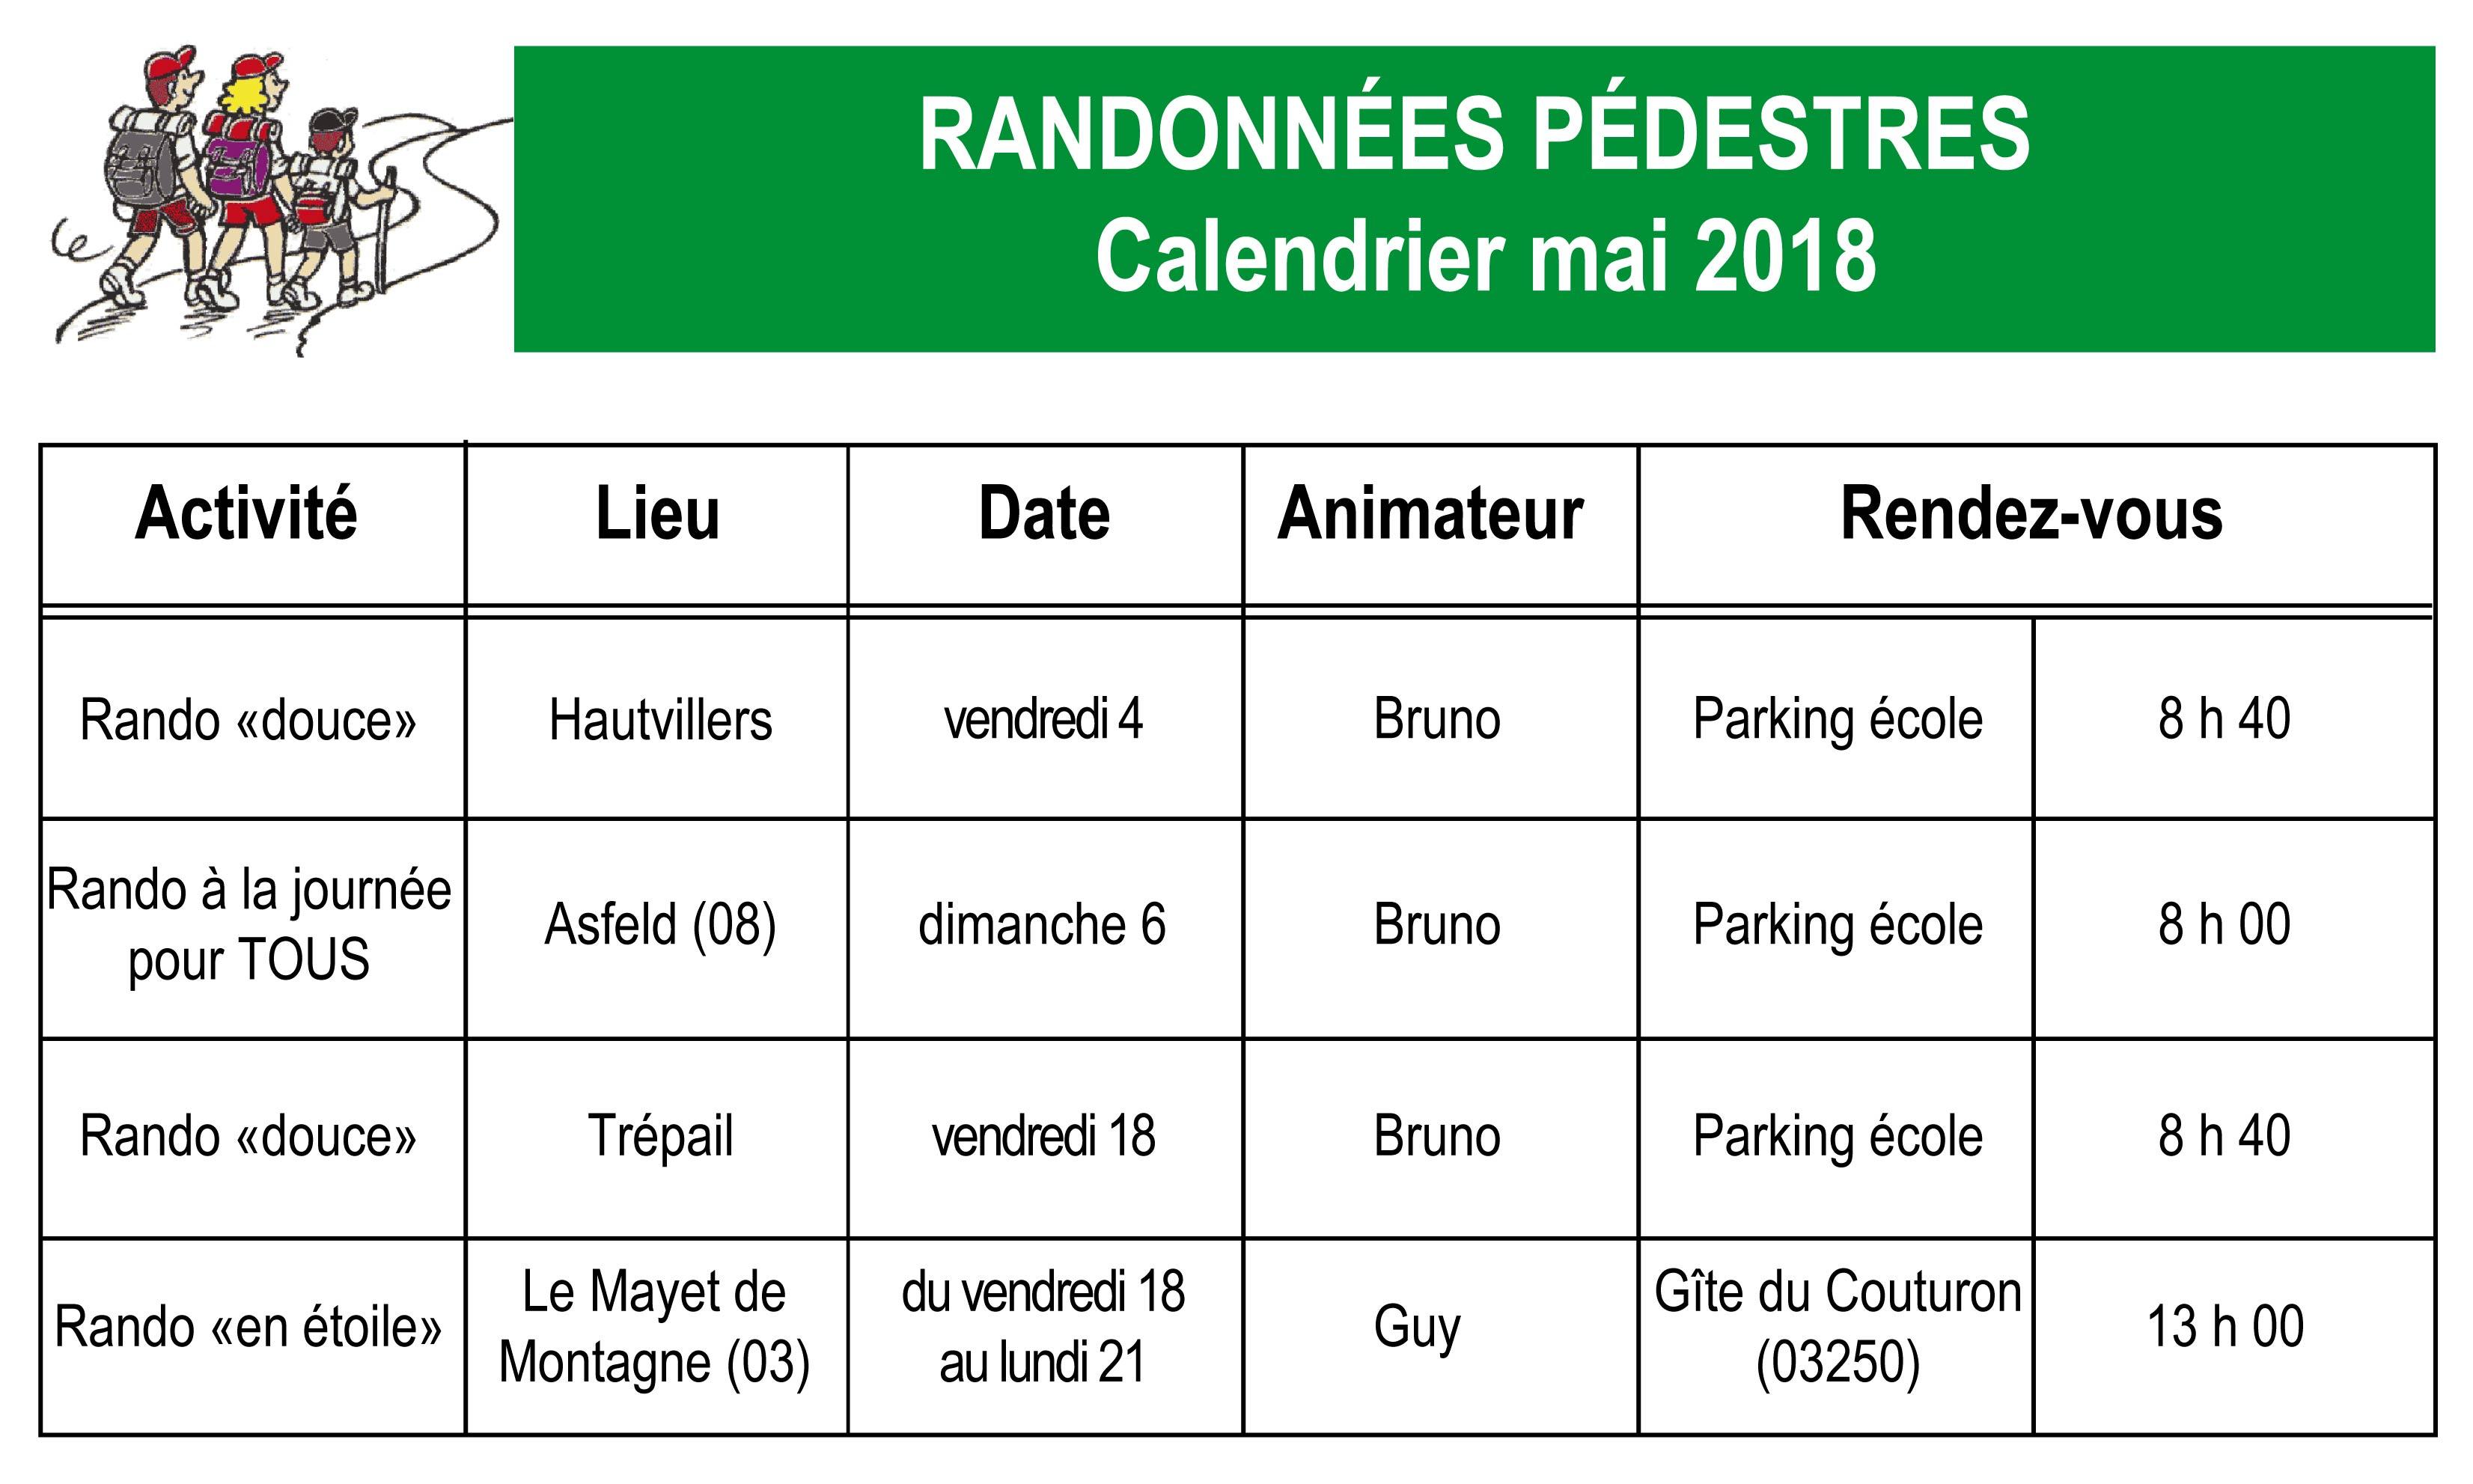 Le Calendrier Des Randonnees Pedestres Du Joli Mois De Mai 2018